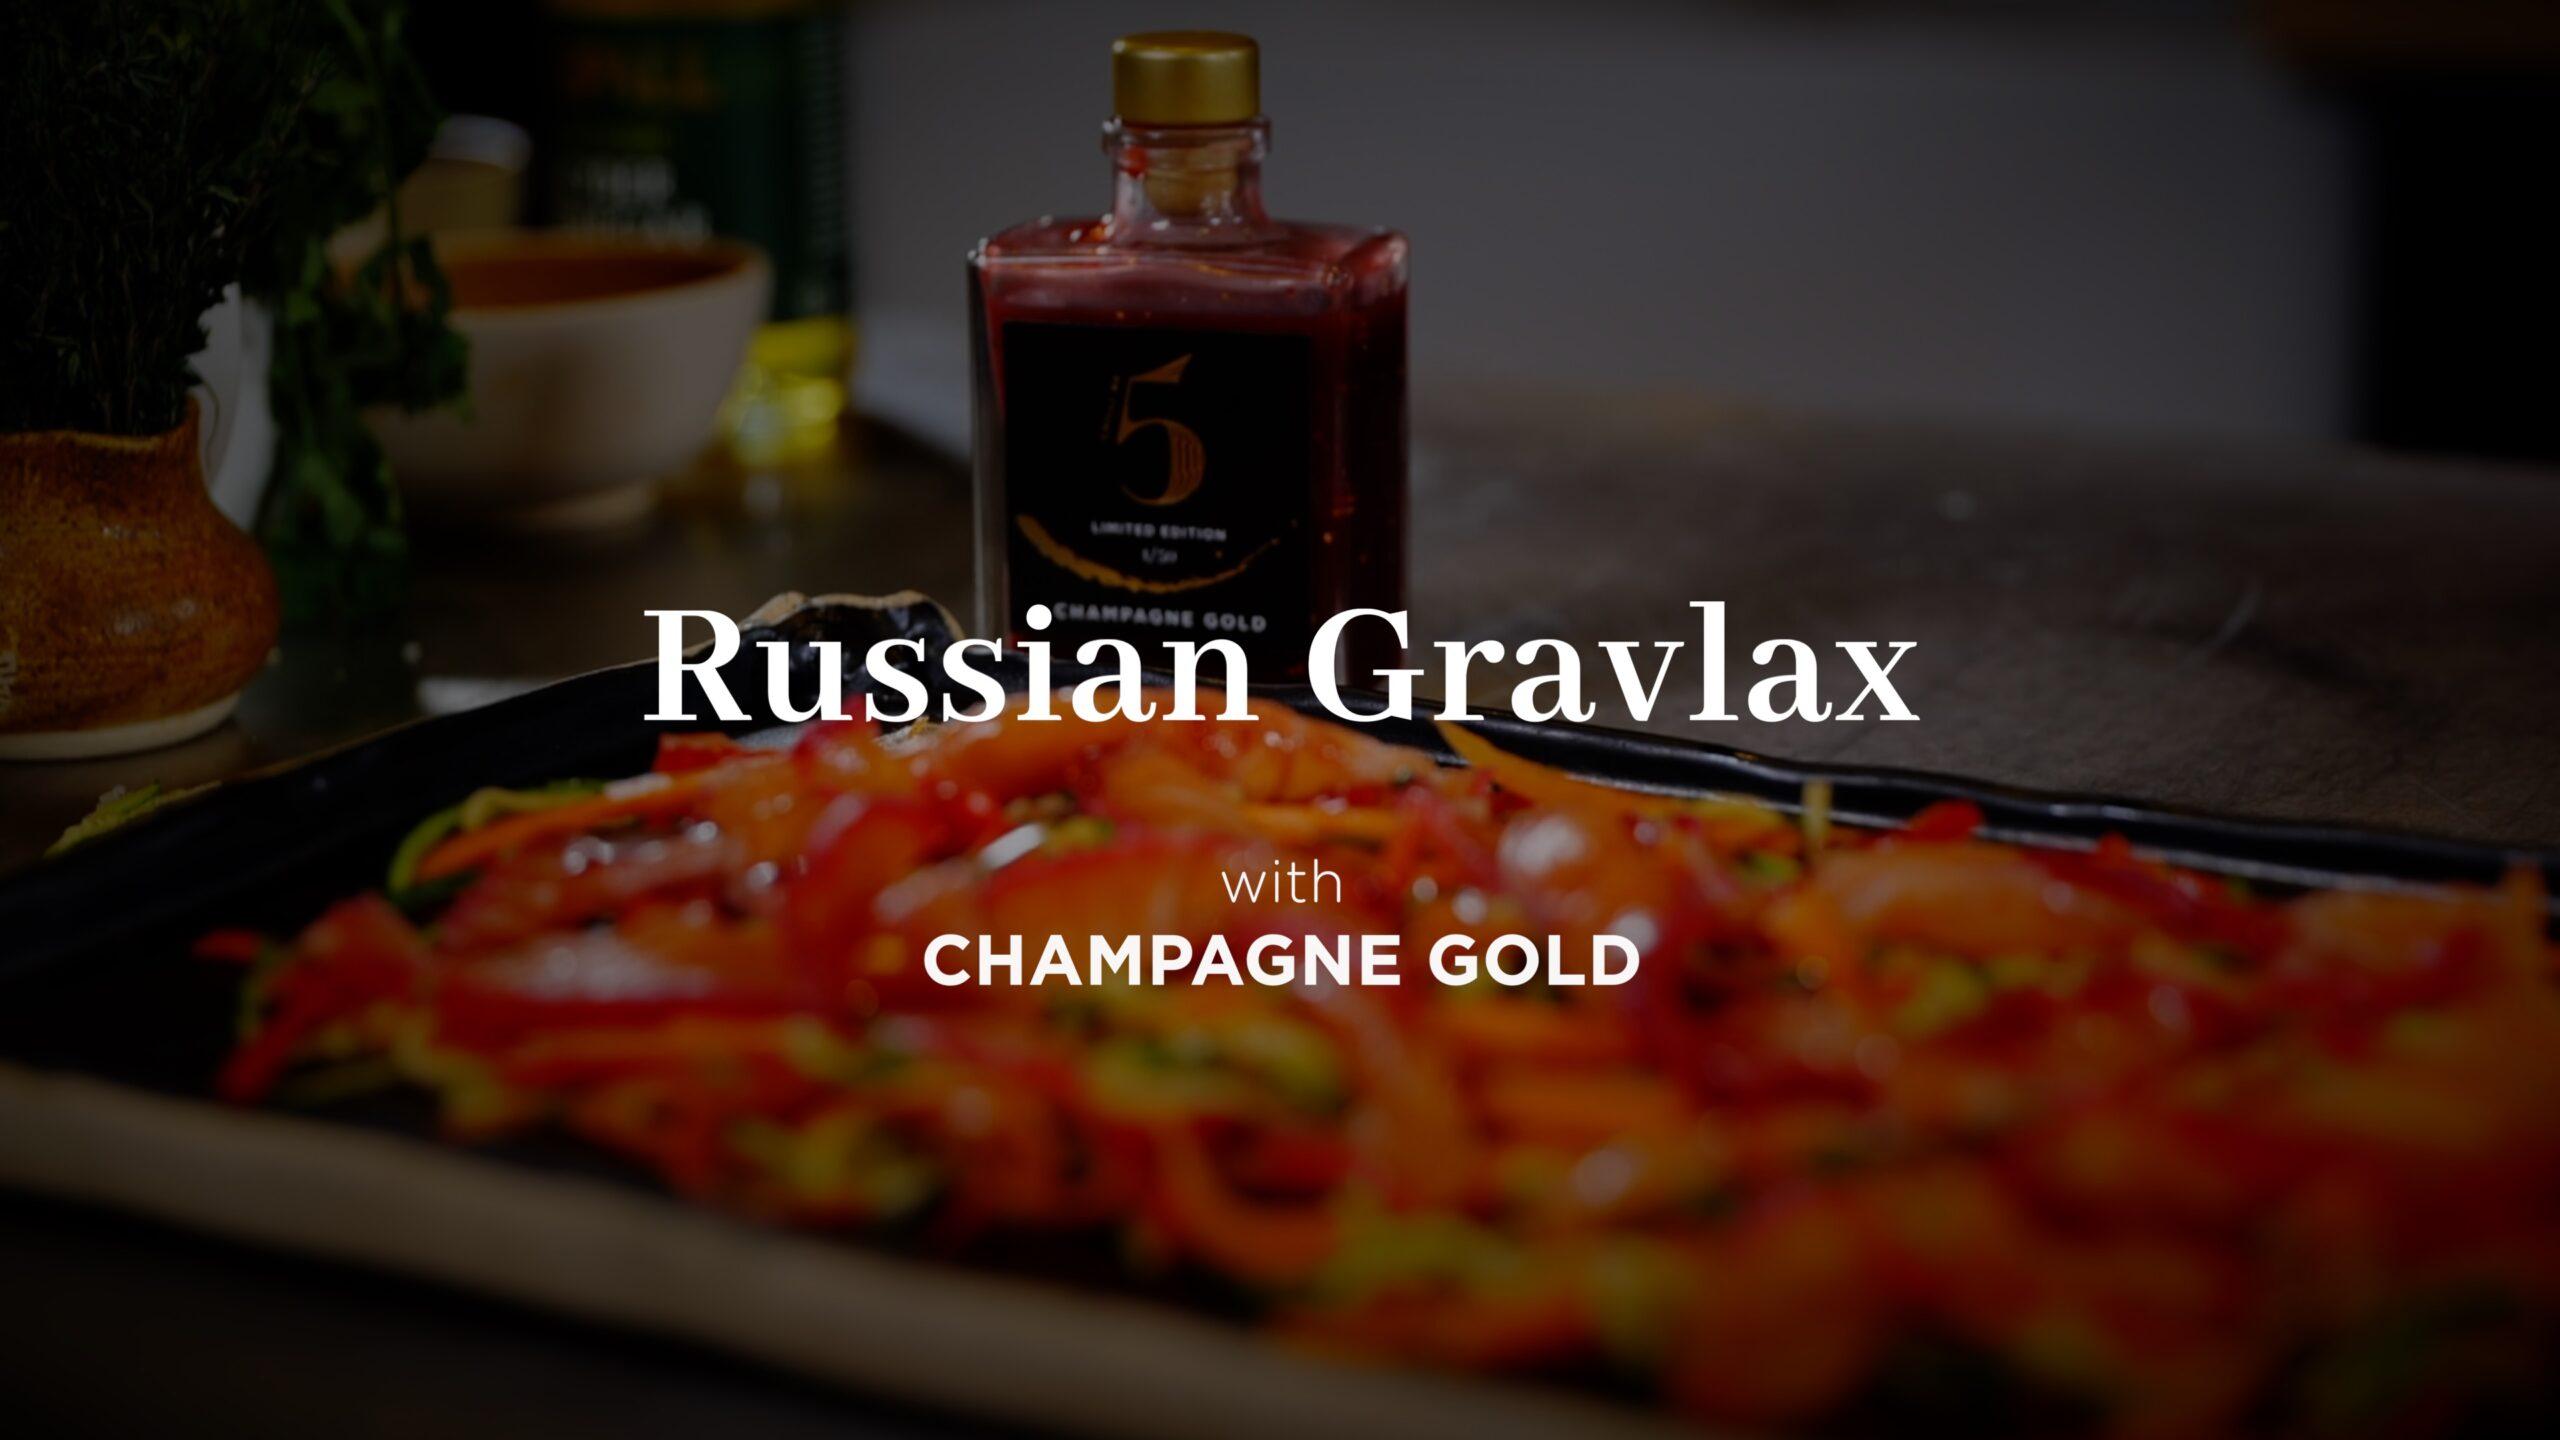 Chilli No. 5 - Superfood Mondays - Russian Gravlax